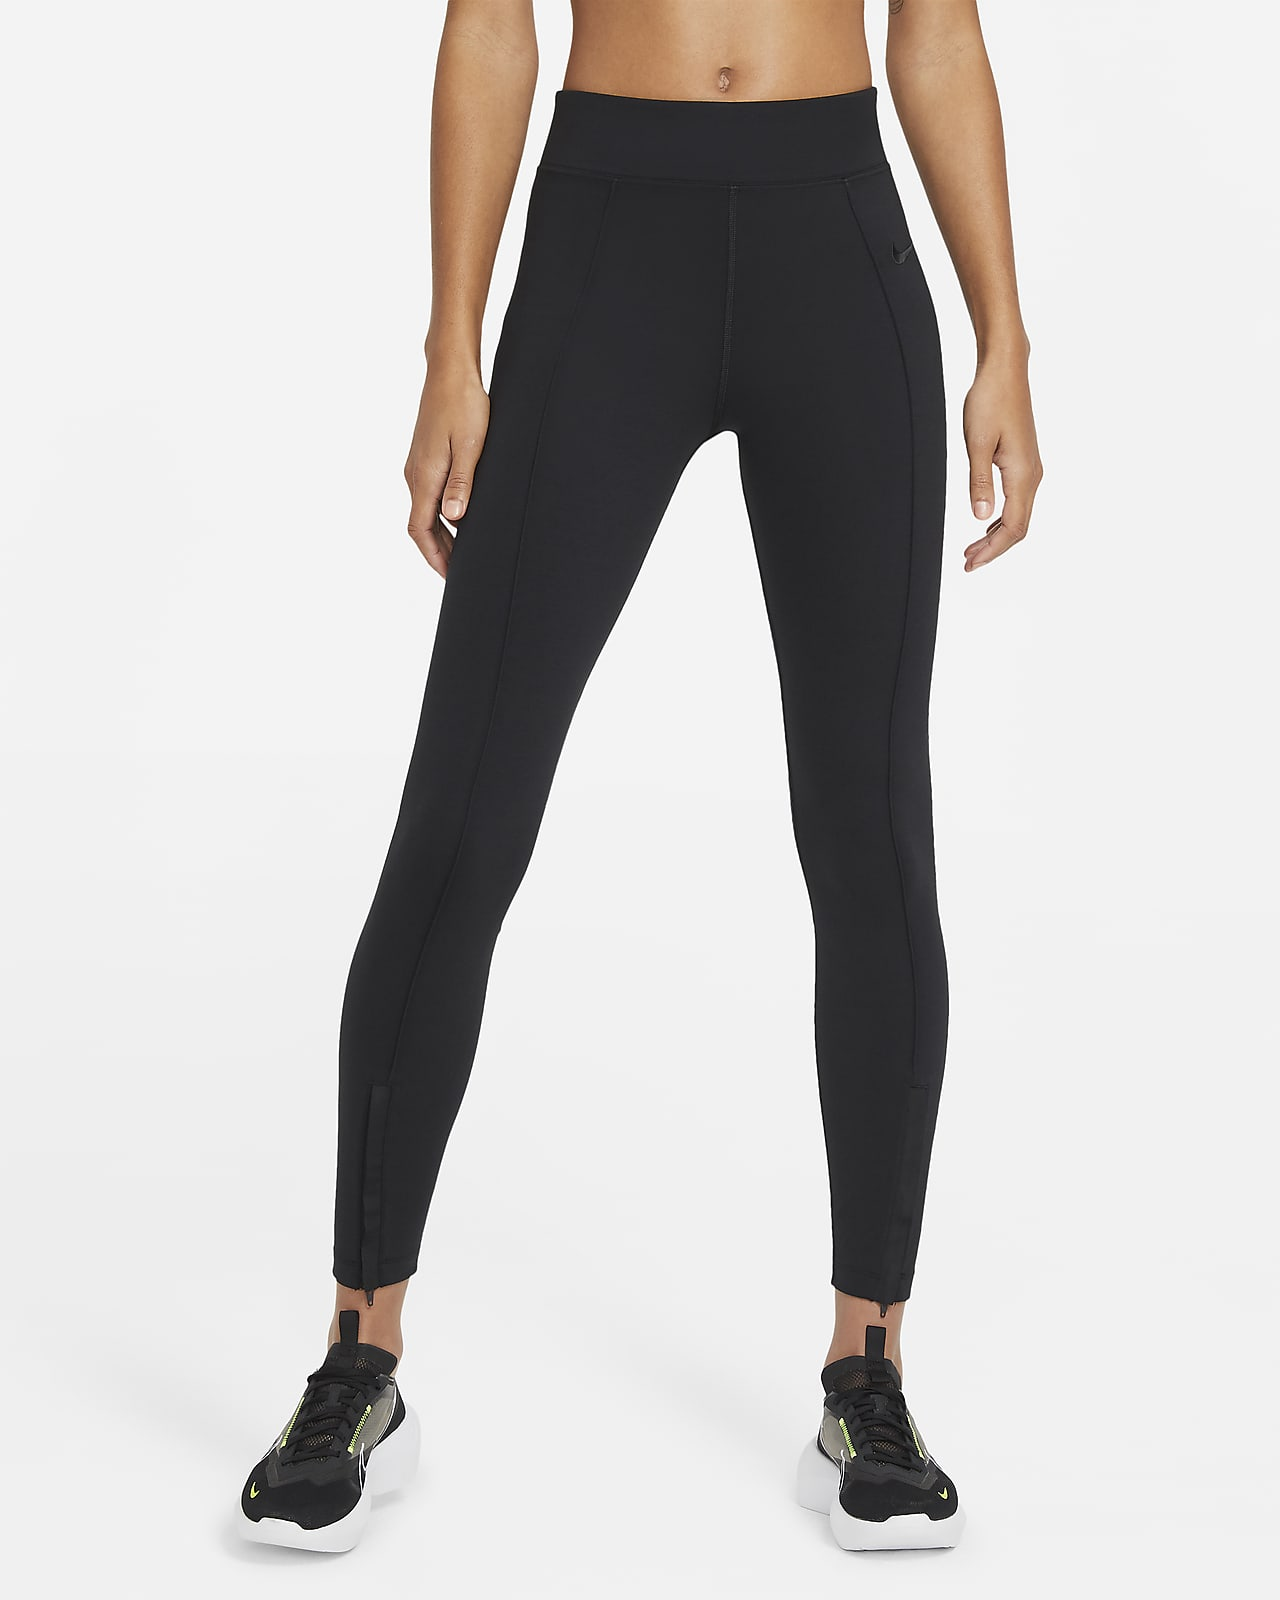 Collant taille haute Nike Sportswear Leg-A-See pour Femme